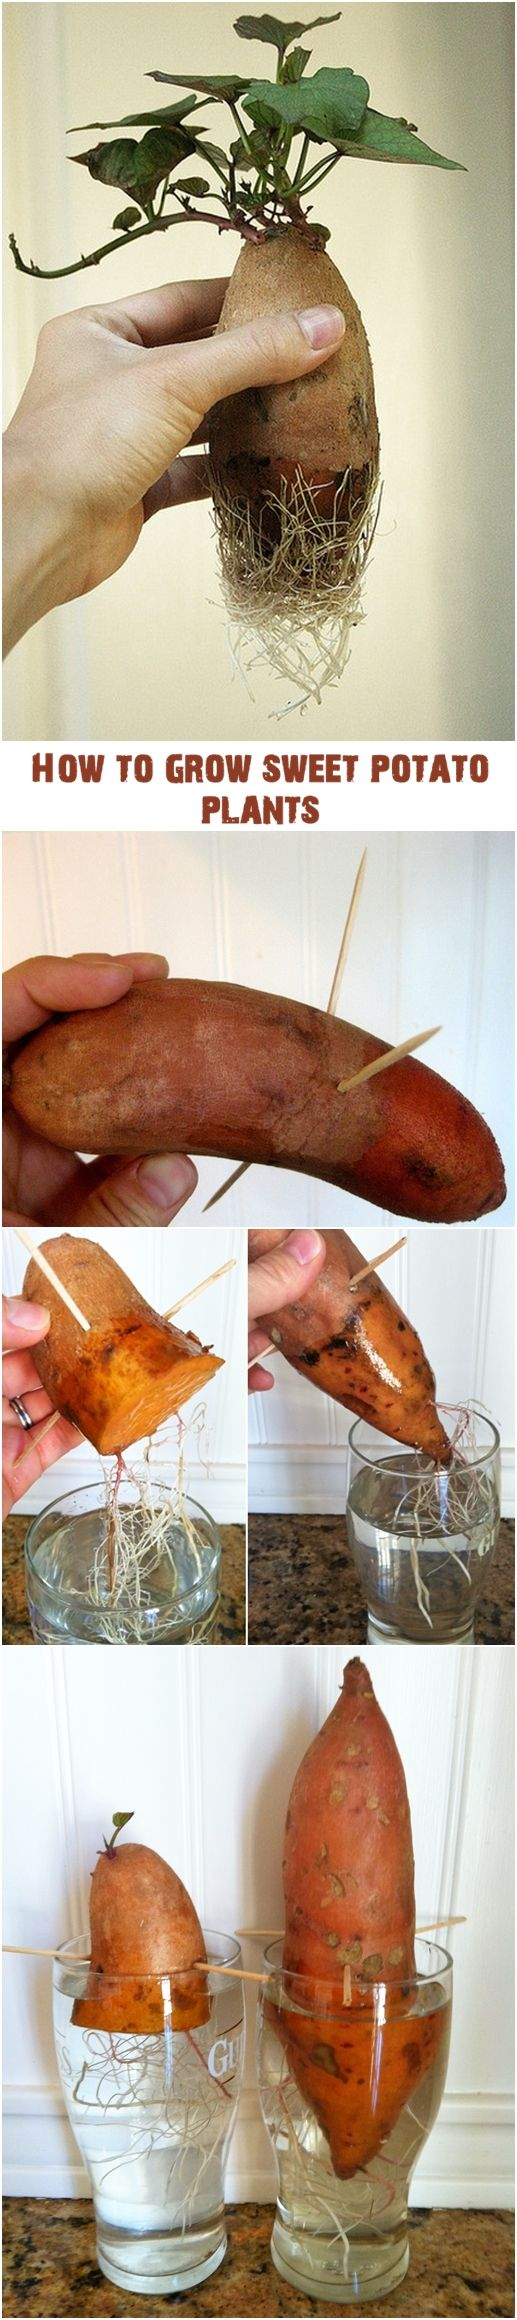 How To Grow Sweet Potato Plants 400 x 300